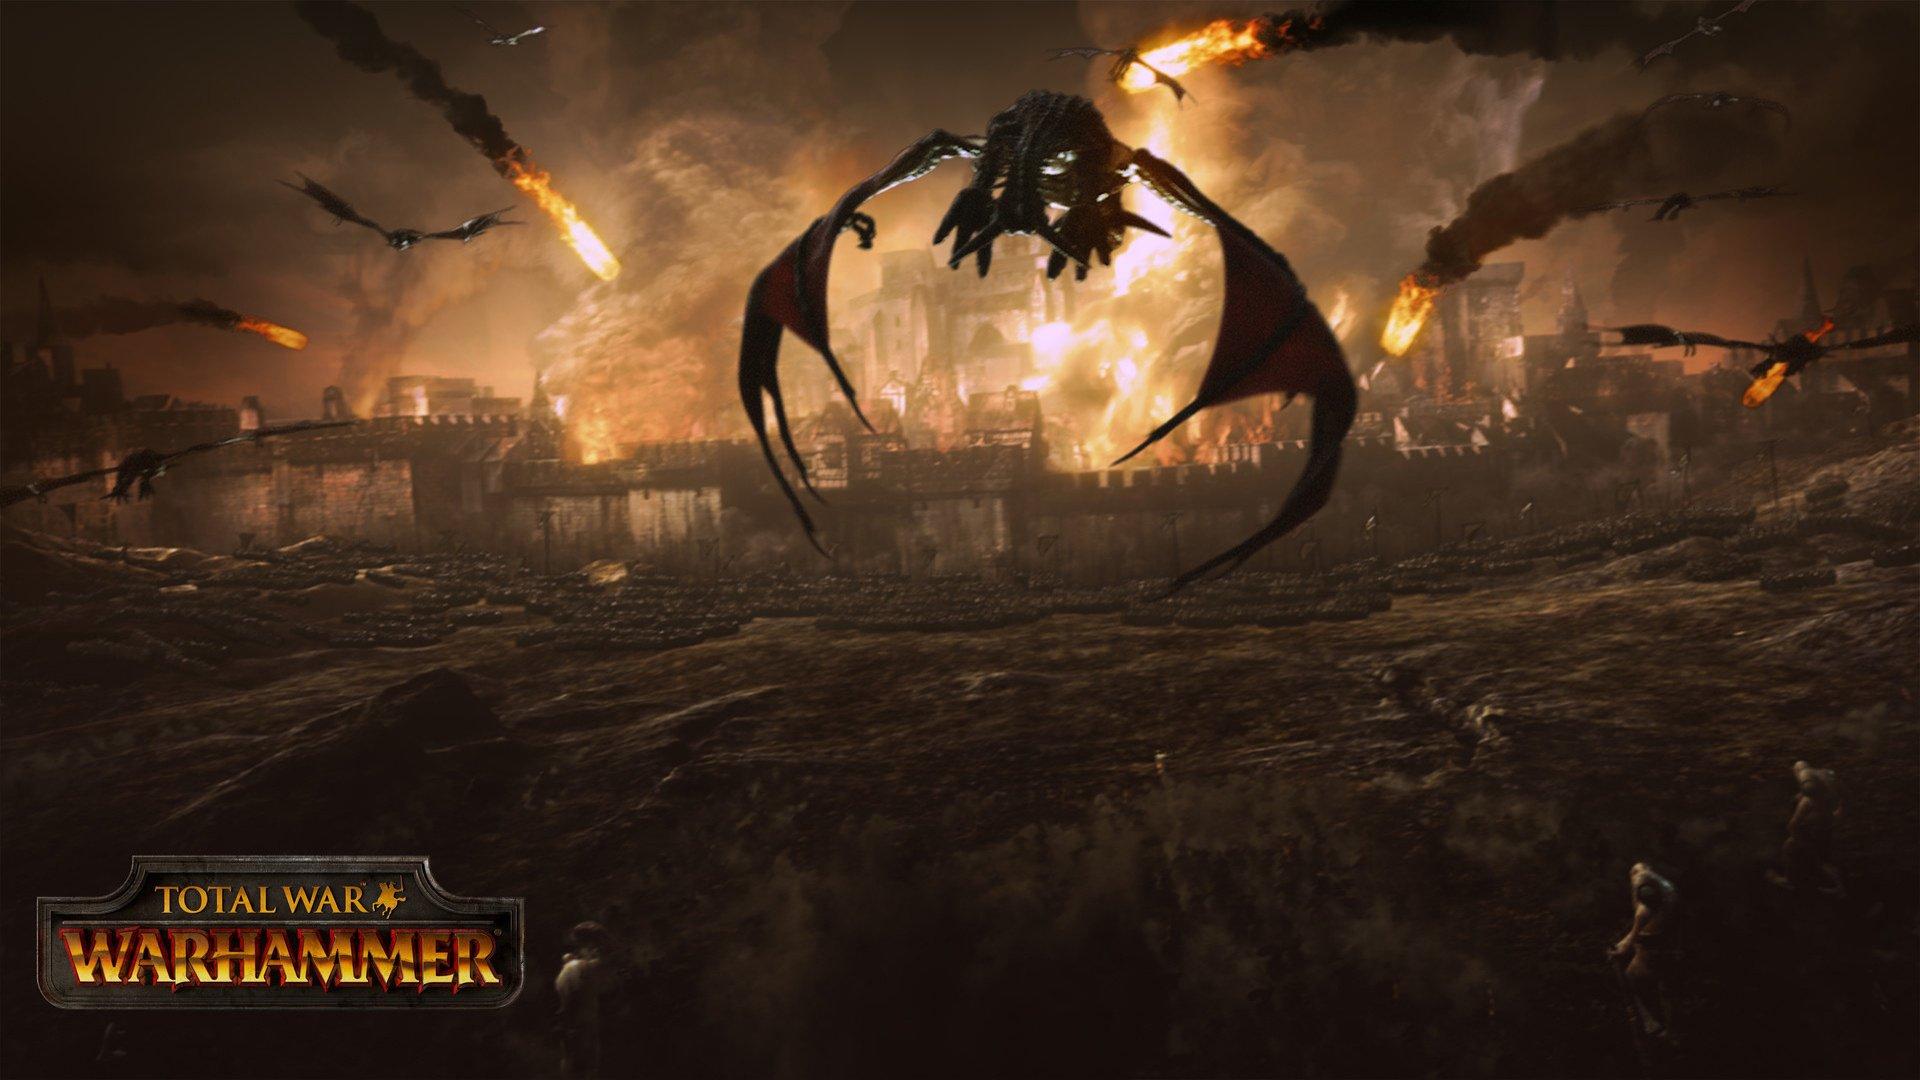 WallpapersWide Free Total War: Warhammer Wallpapers 1920x1080